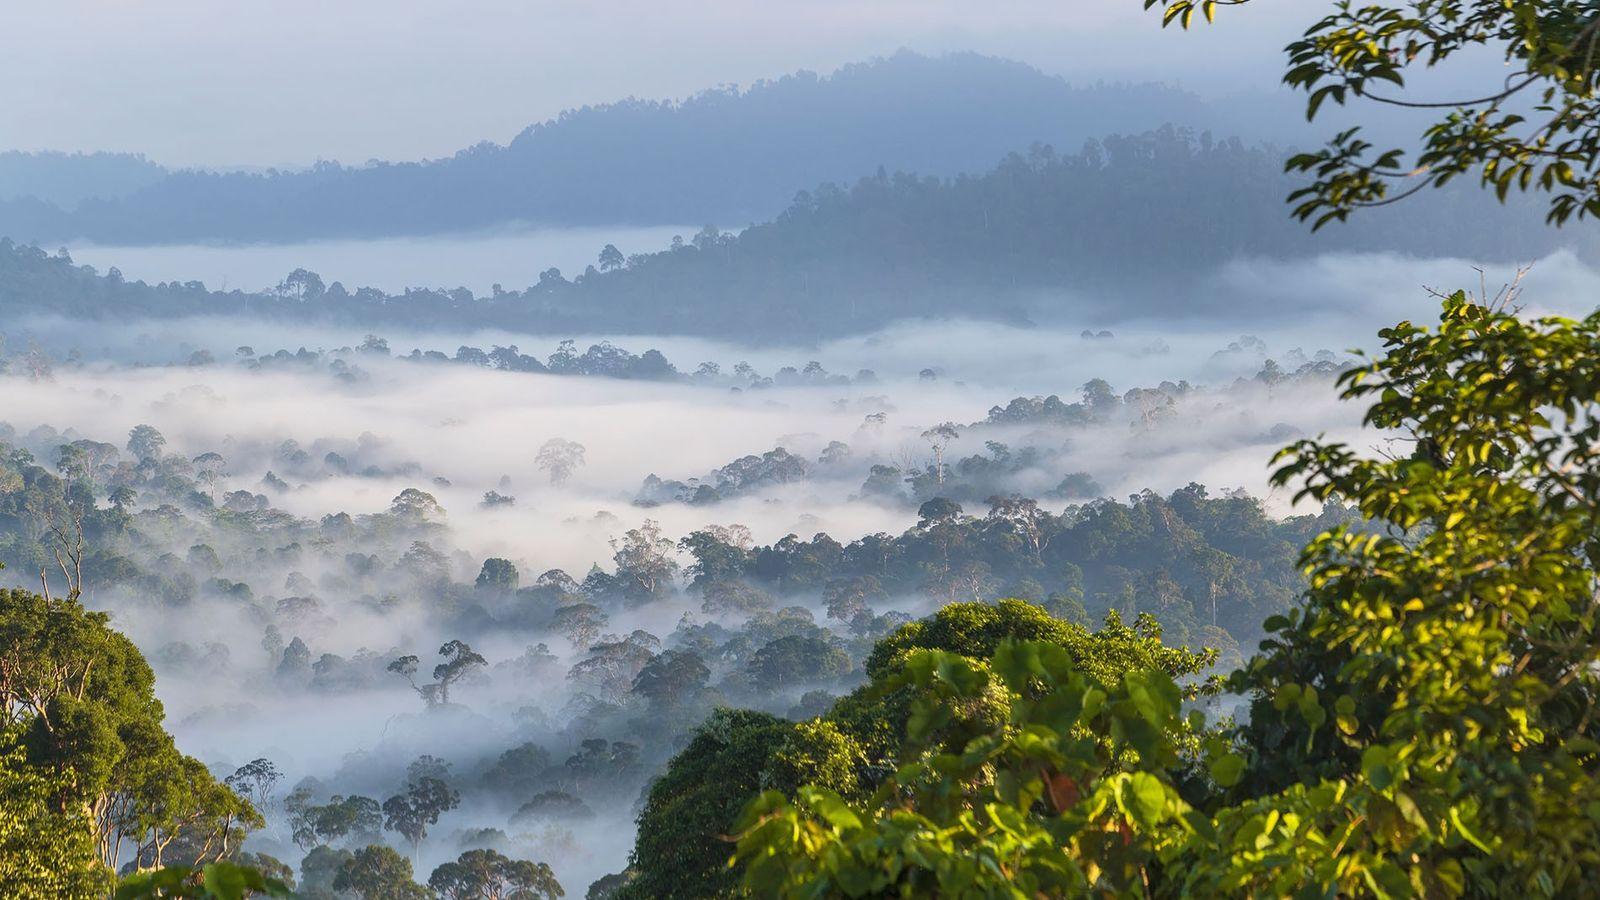 Mist over Borneo rainforest